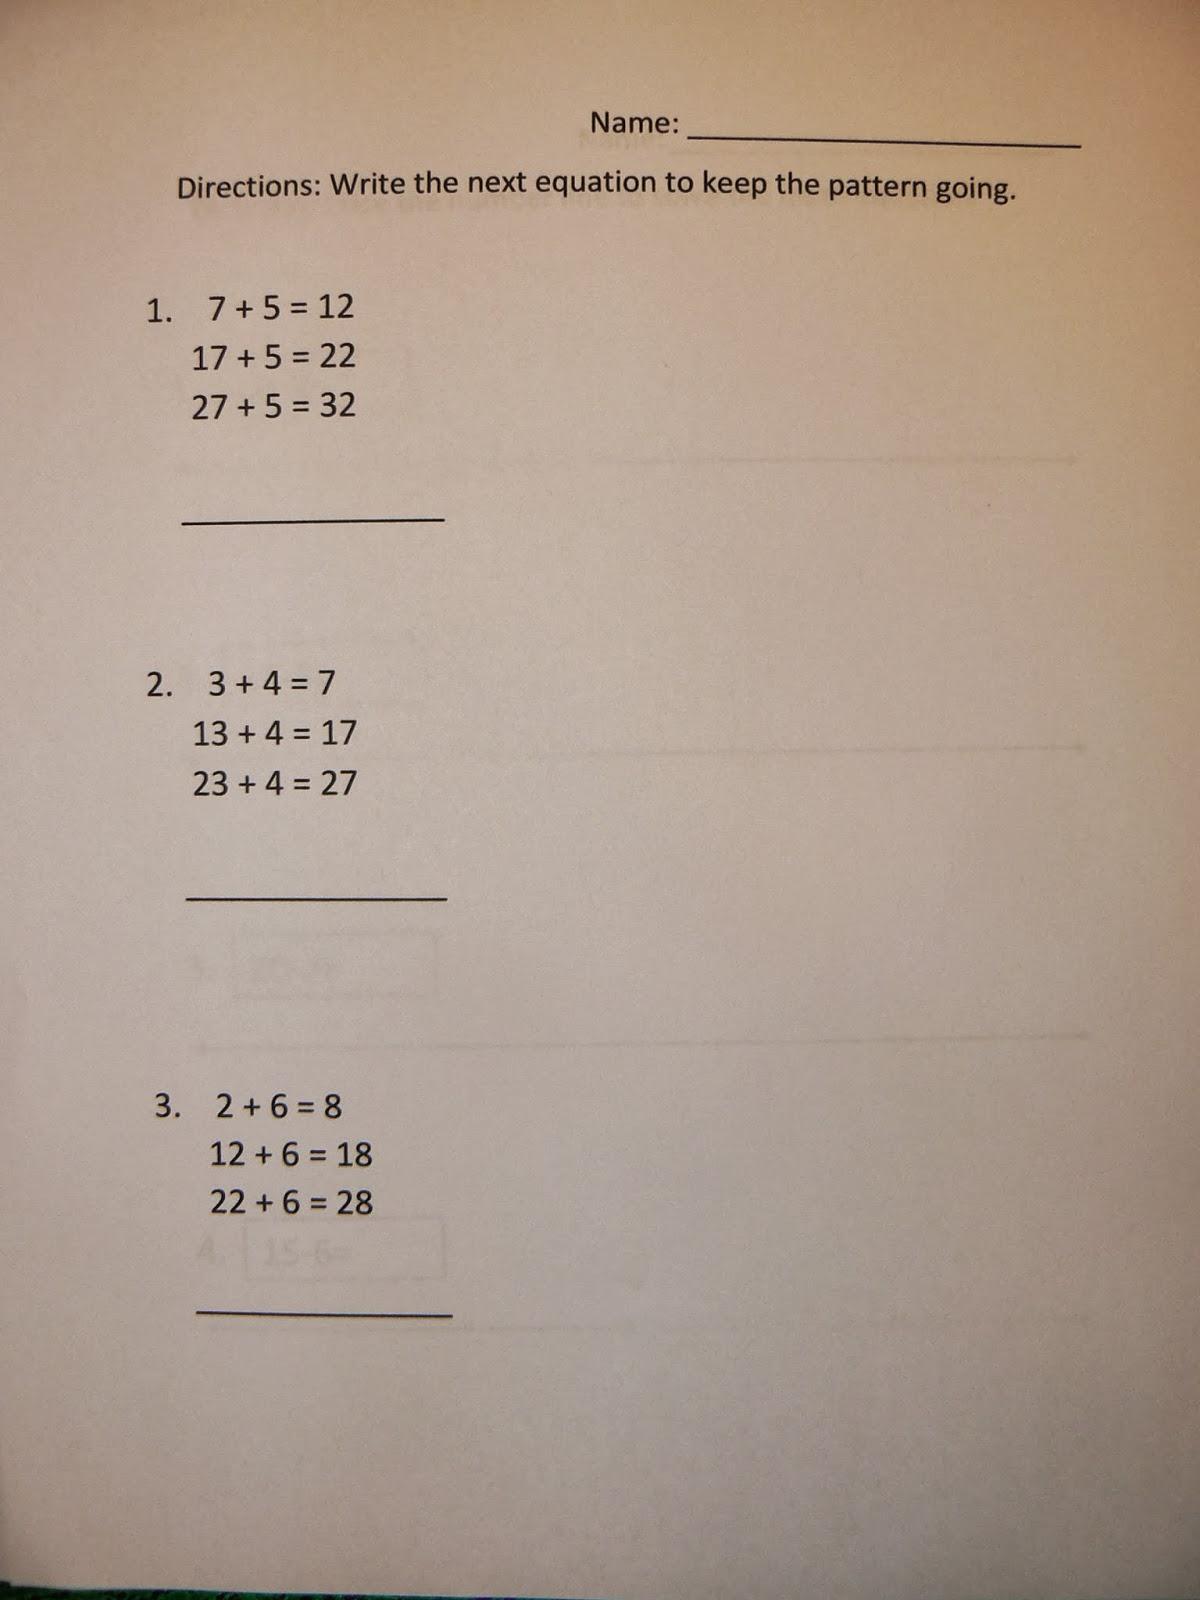 Adding Patterns By 10